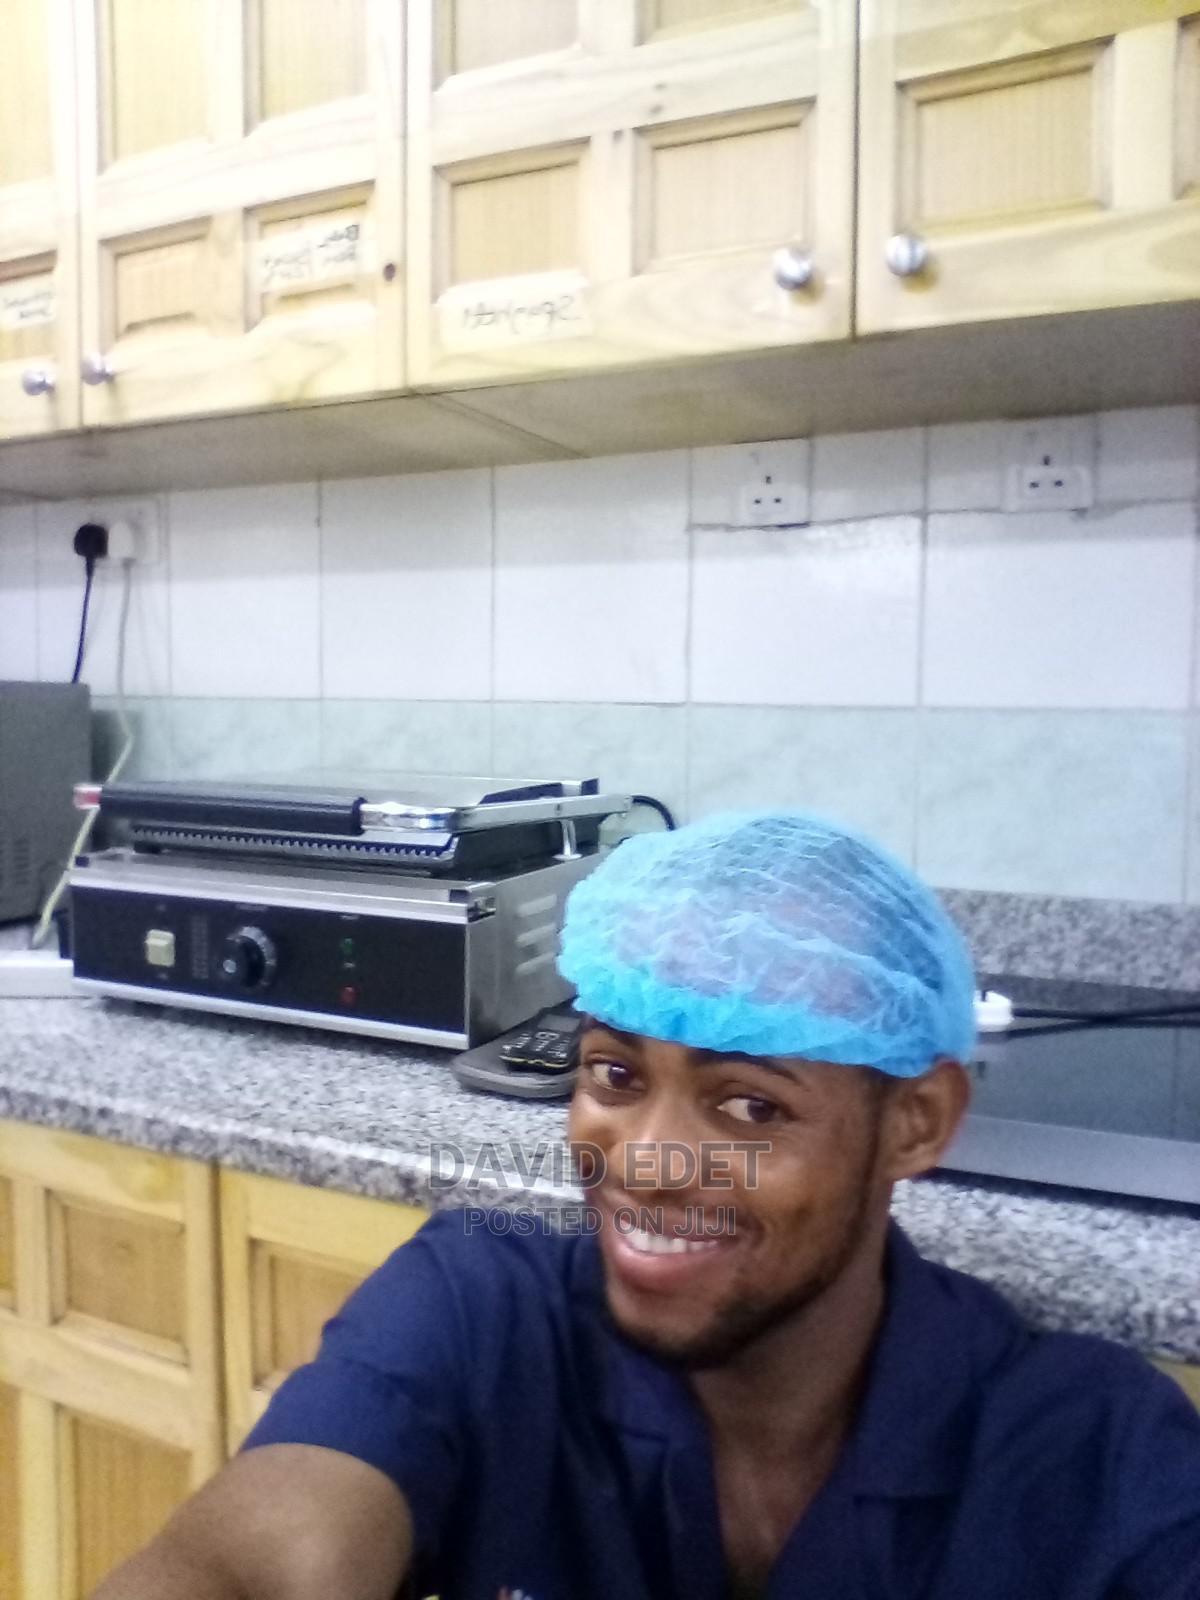 Chef David | Restaurant & Bar CVs for sale in Asokoro, Abuja (FCT) State, Nigeria